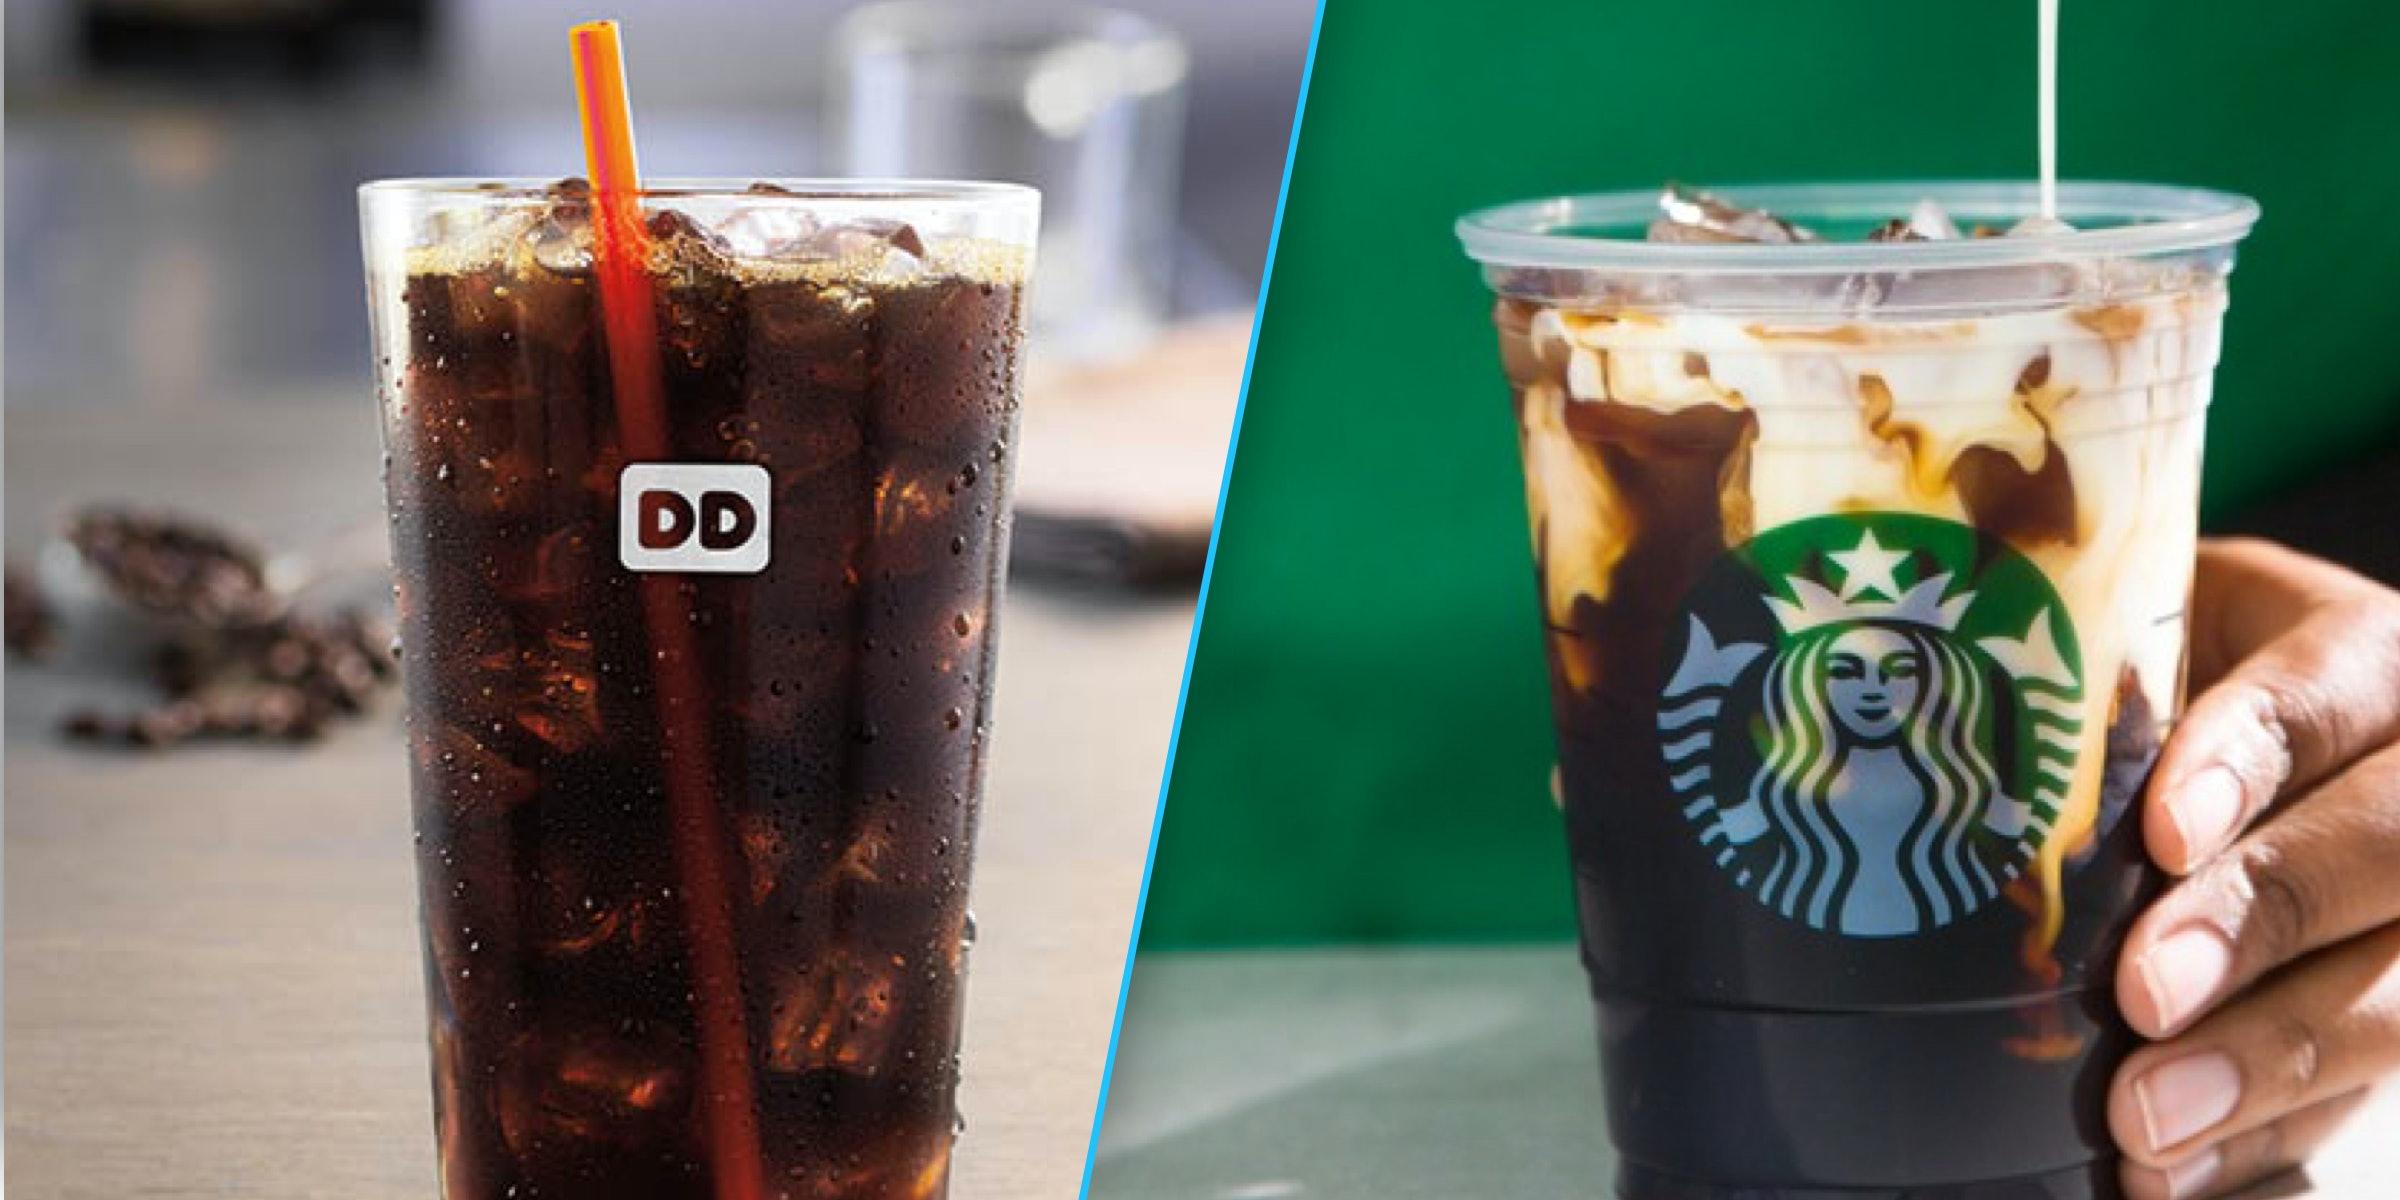 How to make starbucks iced coffee taste like dunkin